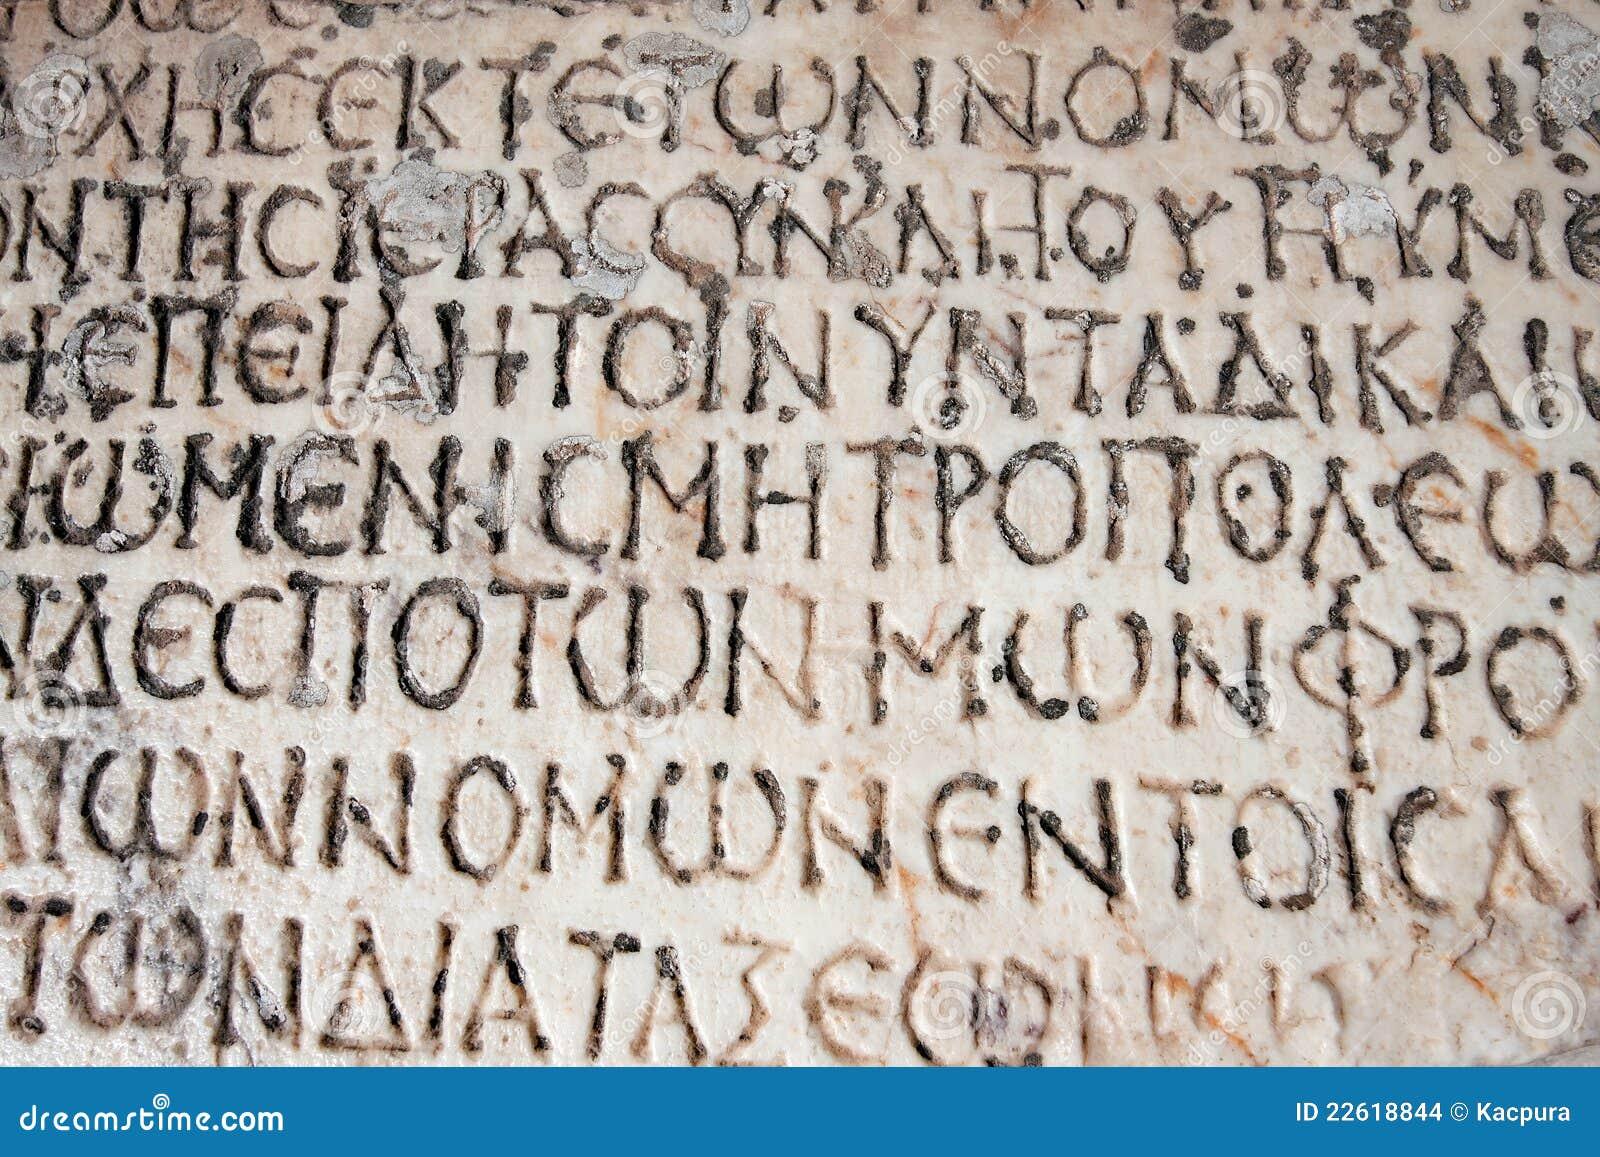 Greek handwriting  Handwritten Greek letters  How to